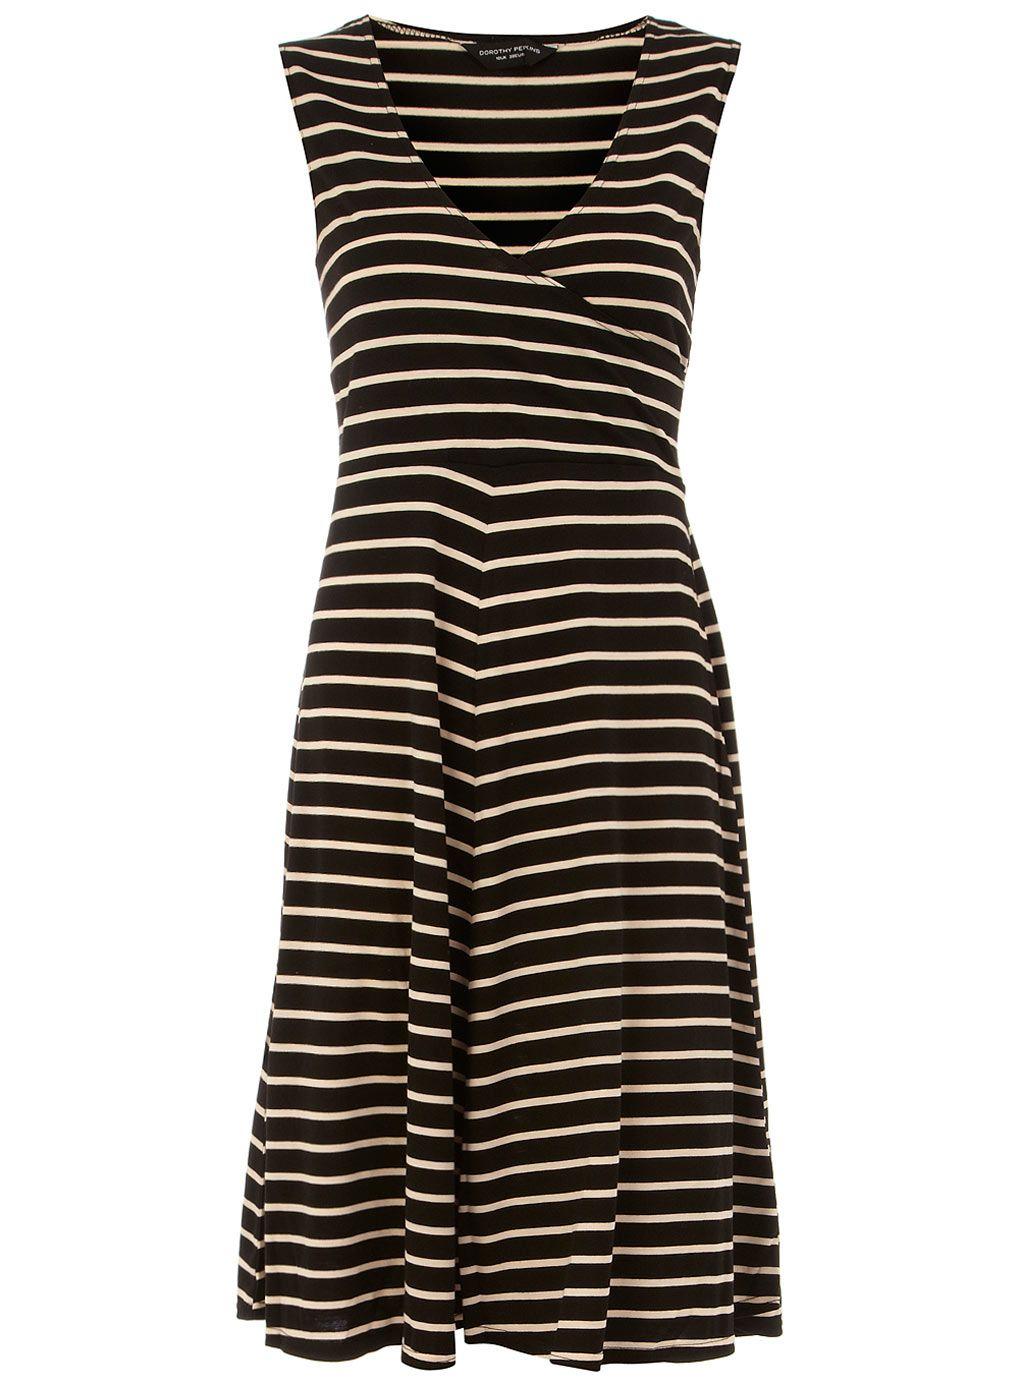 Black Blush Wrap Jersey Dress Dorothy Perkins My Style